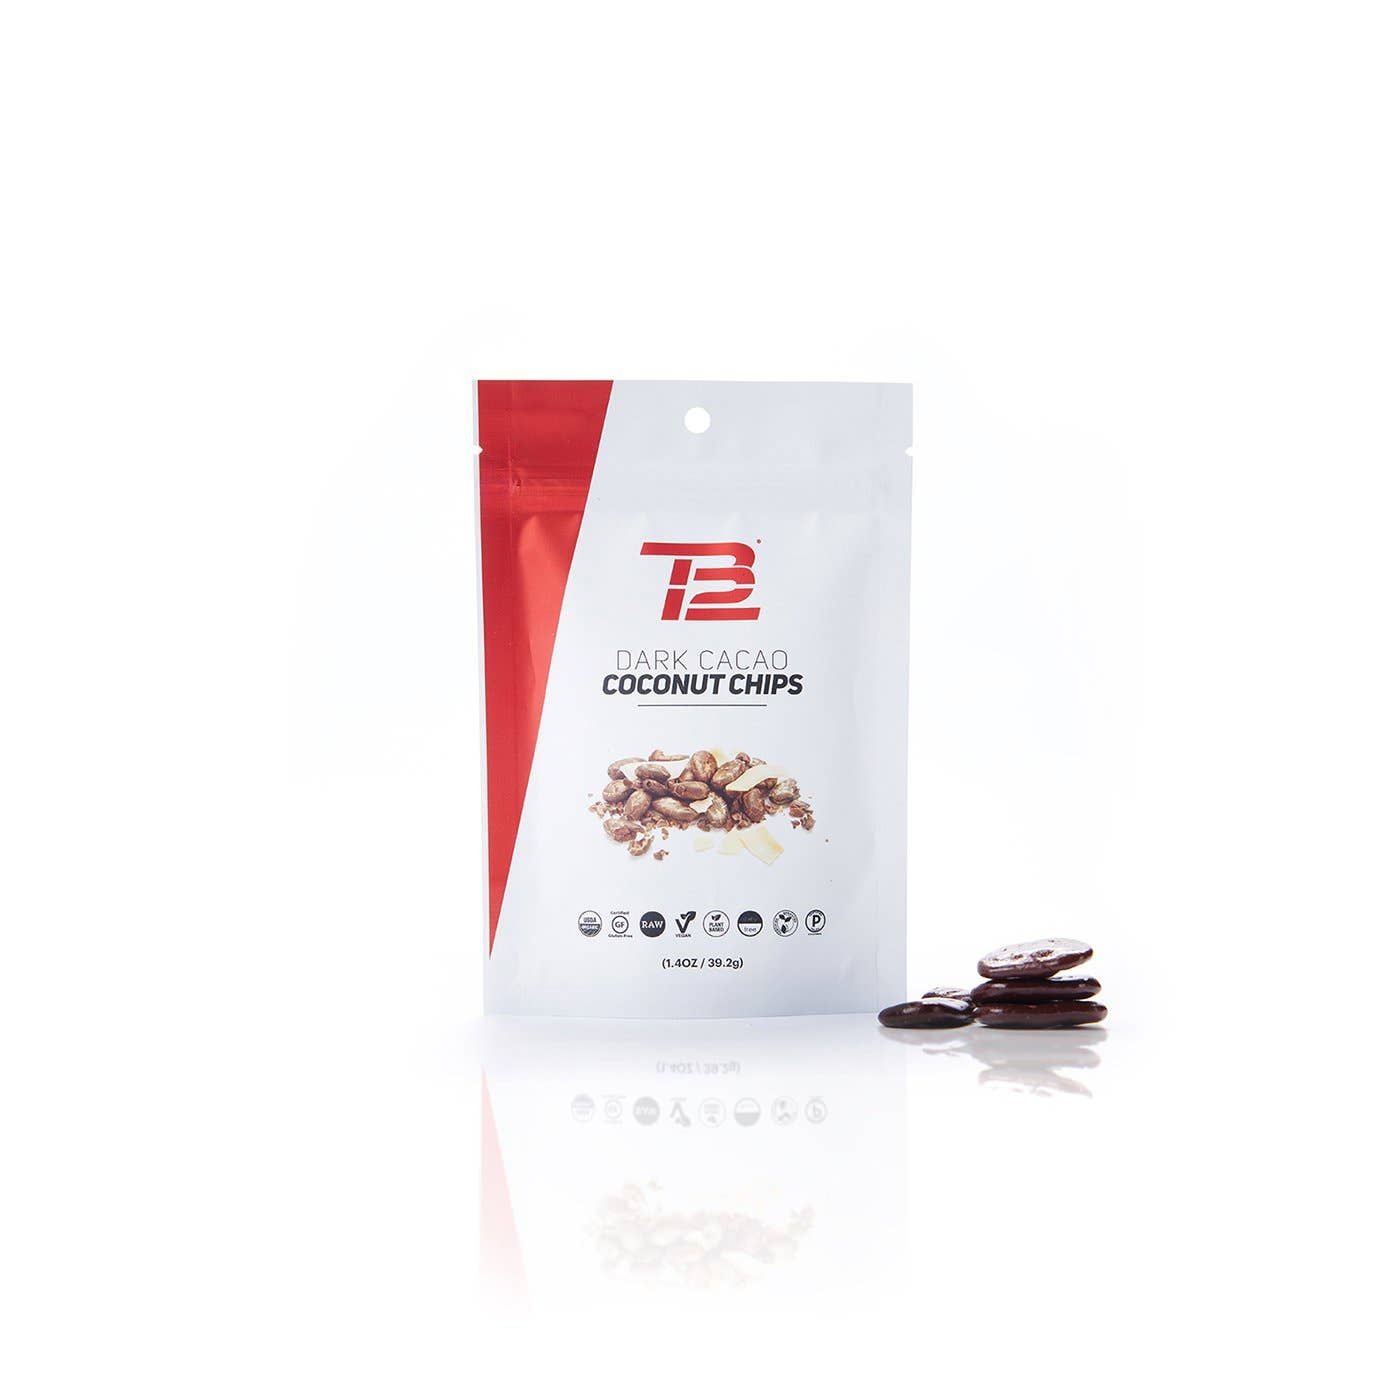 TB12™ Dark Cacao Coconut Chips